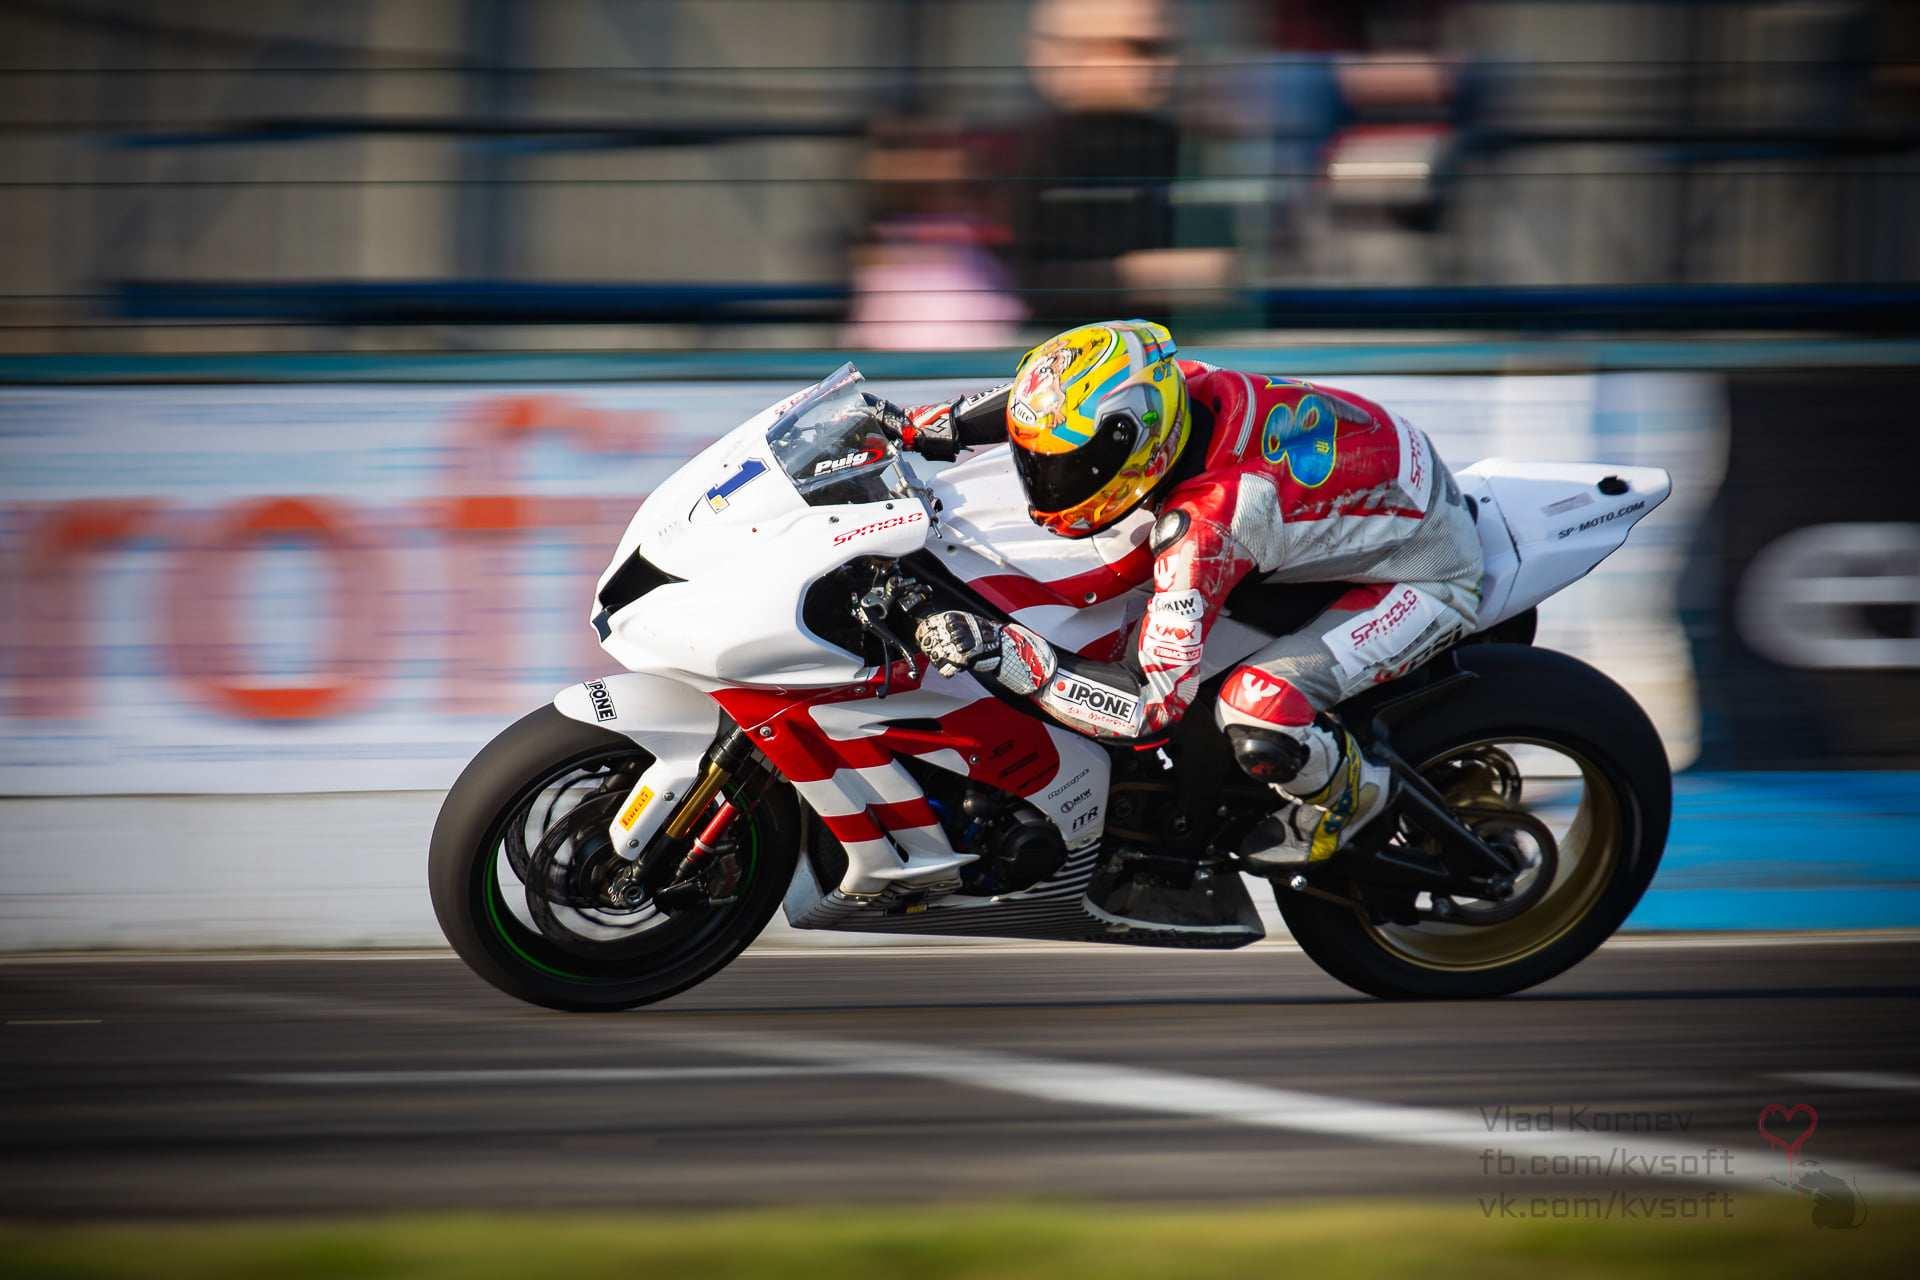 5-6_etap_MotoGPUkraine_132